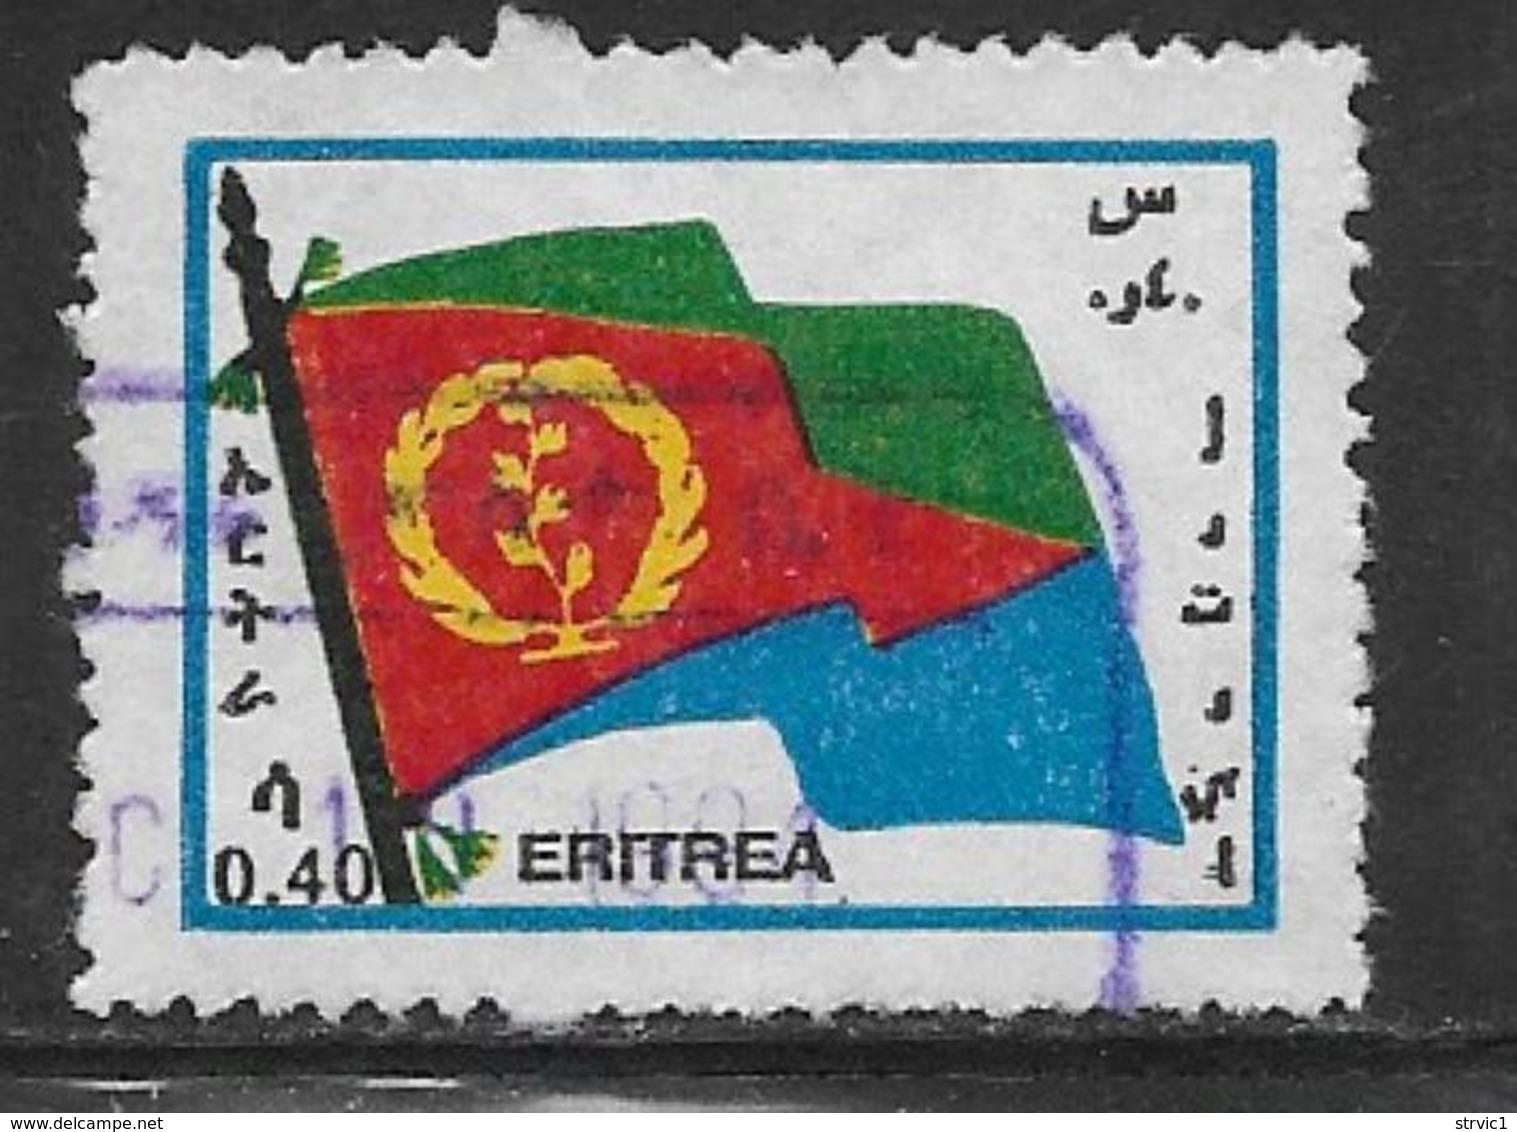 Eritrea Scott # 215 Used Flag, 1994 - Eritrea